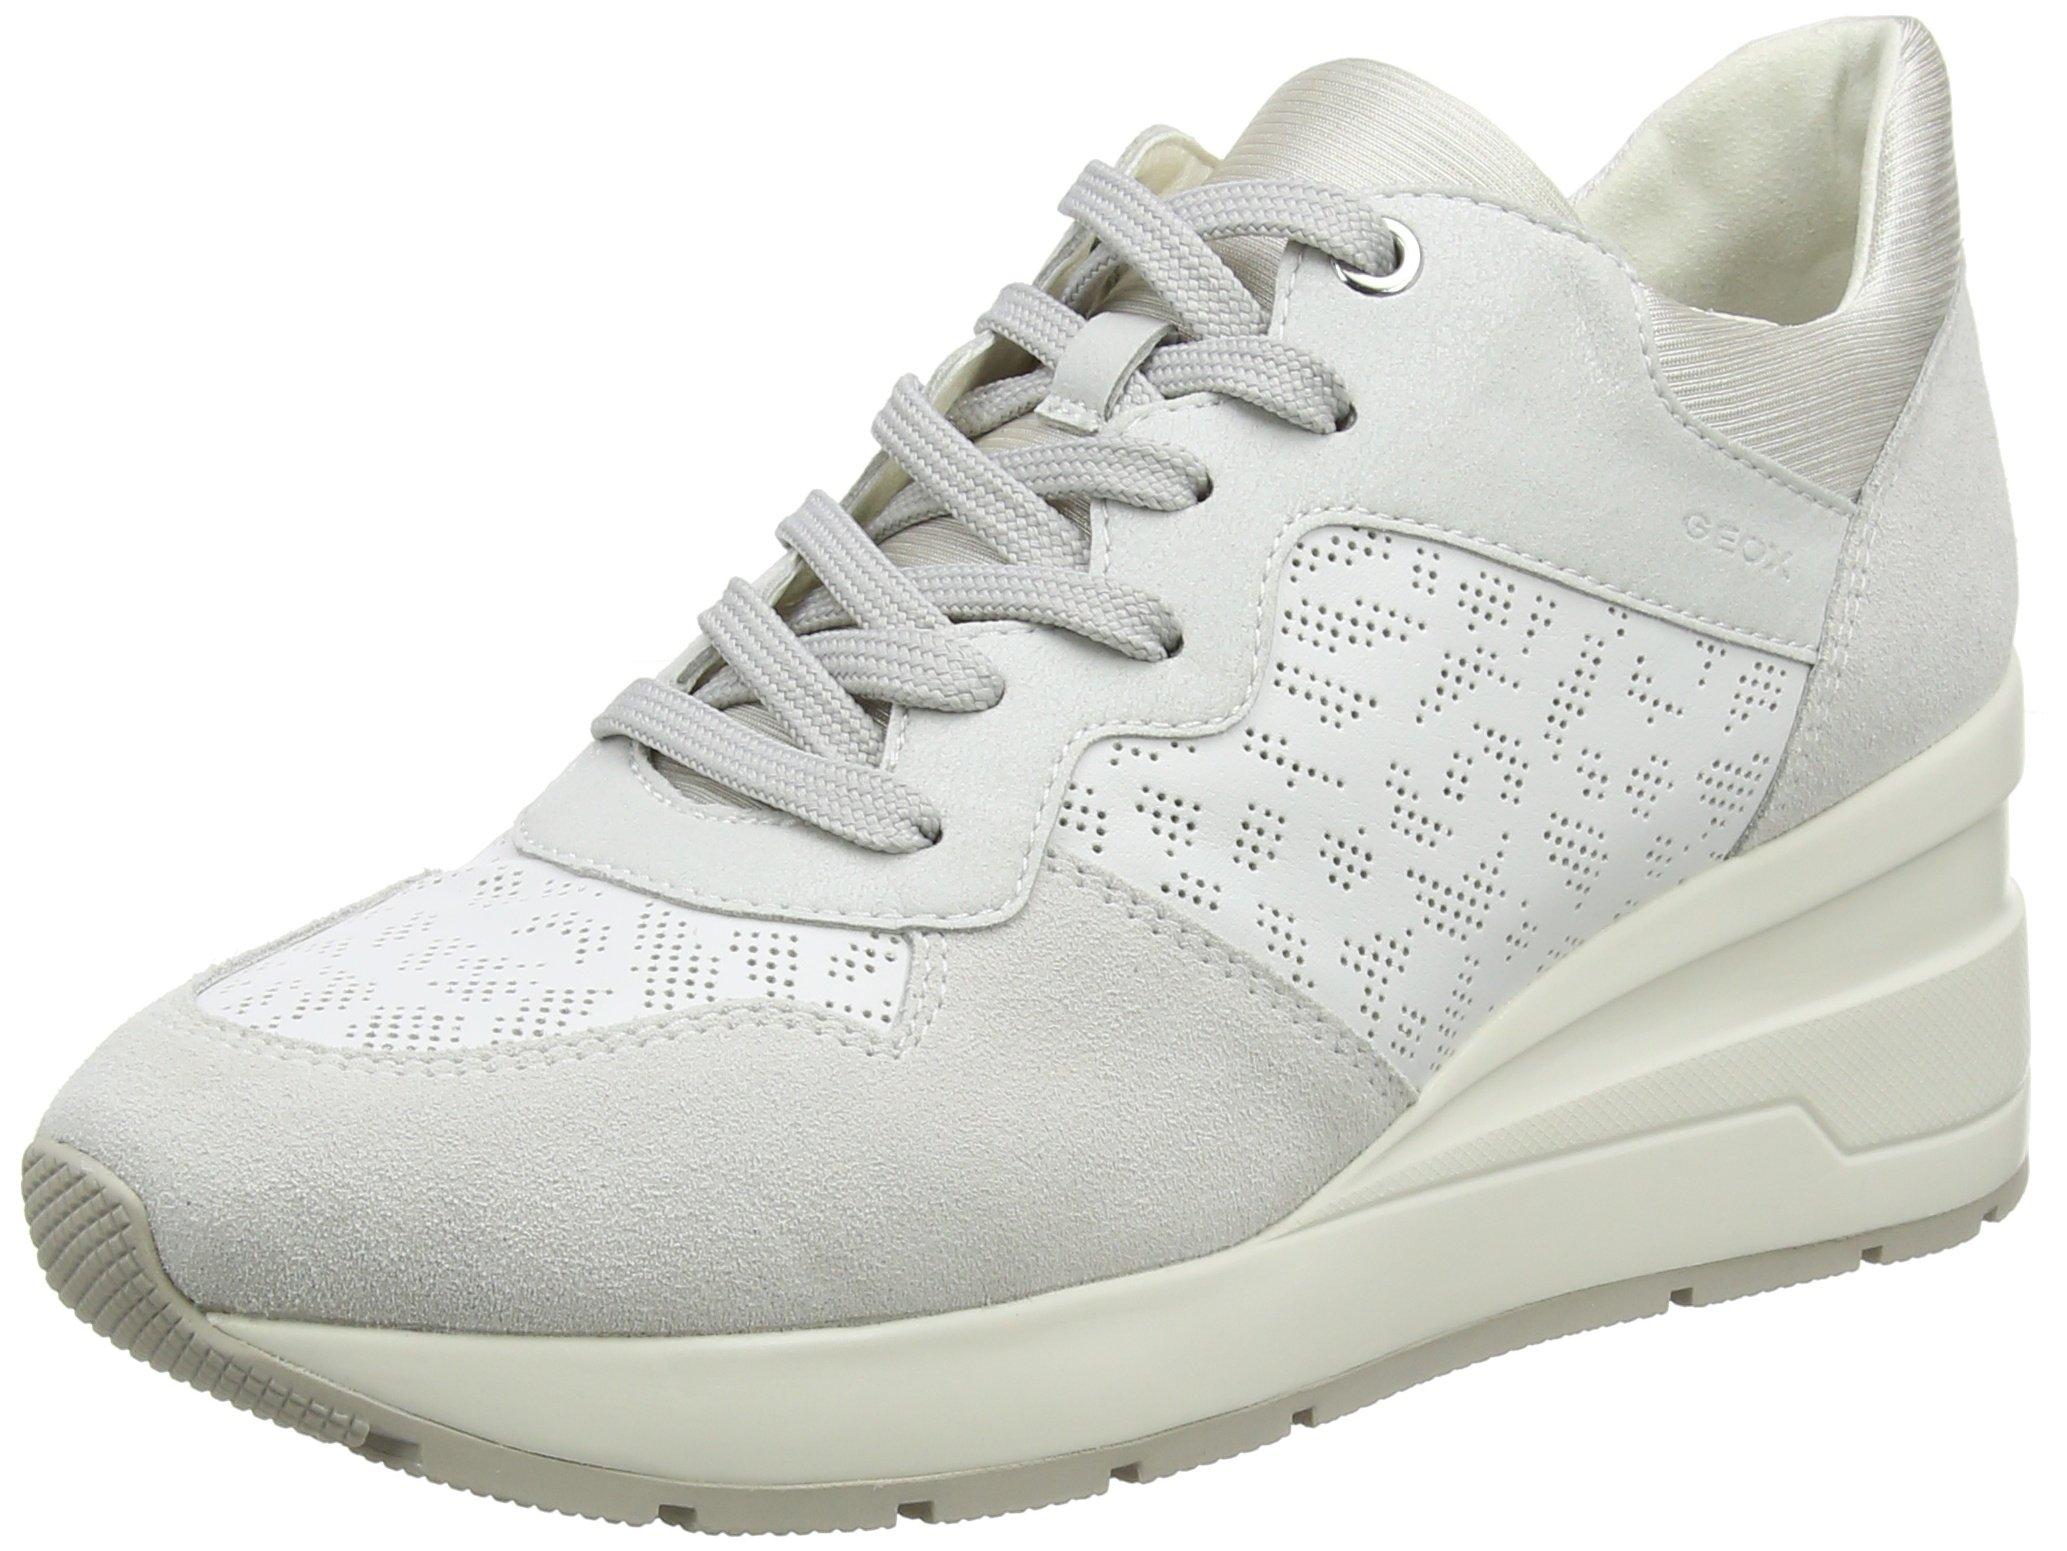 Geox Damen D Zosma C Sneaker 1